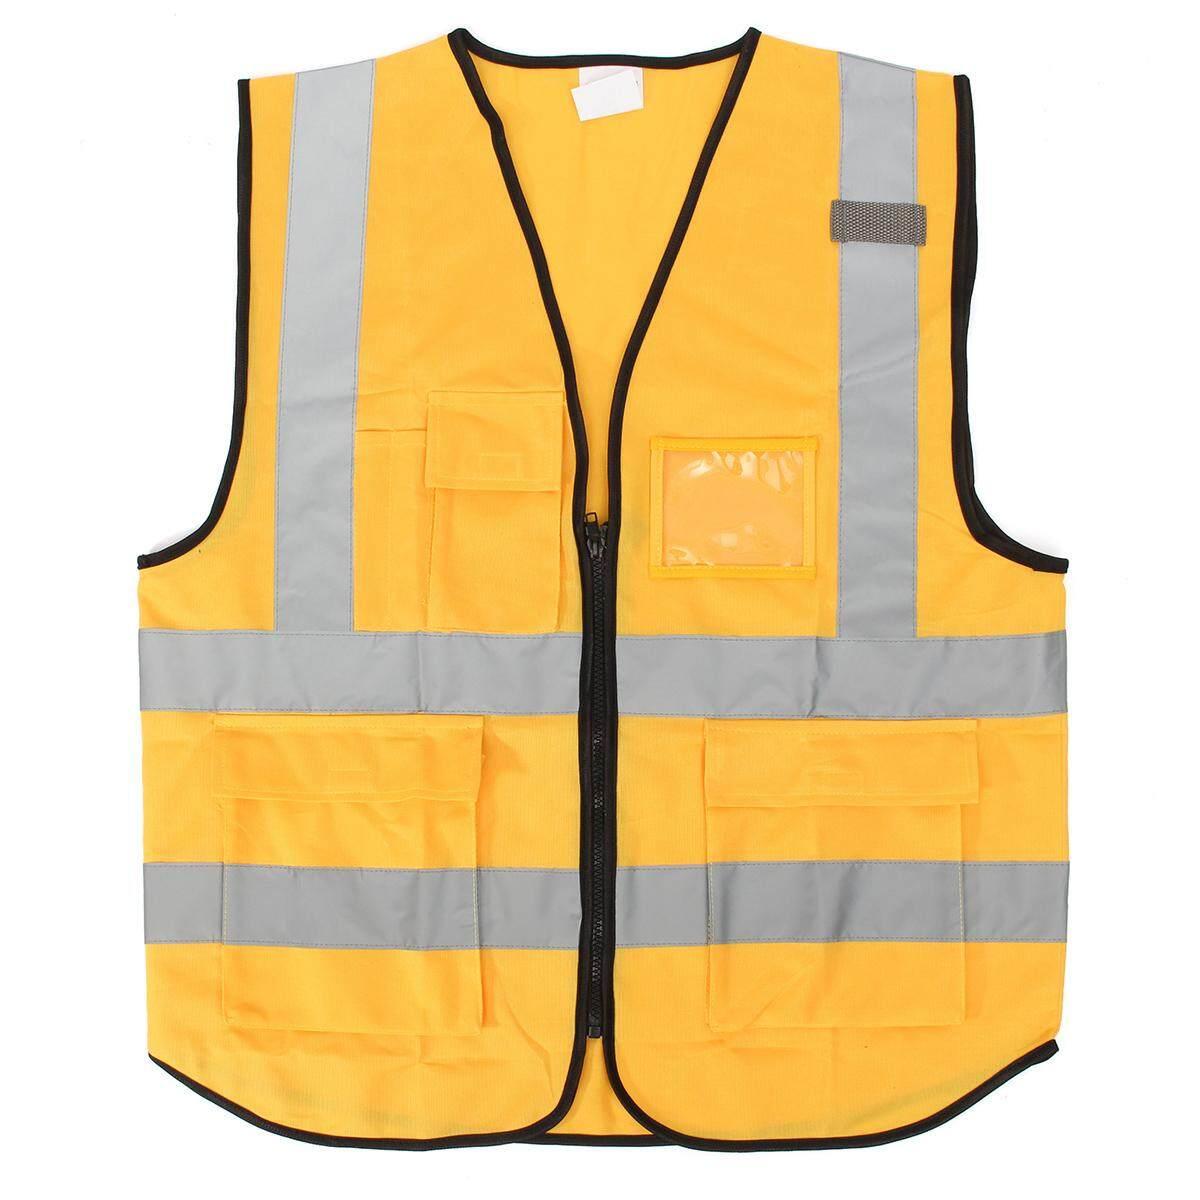 Yellow L Hi Vis Vest Workwear Clothing Safety Reflective Vest Safety Vest Reflective Logo Printing By Freebang.